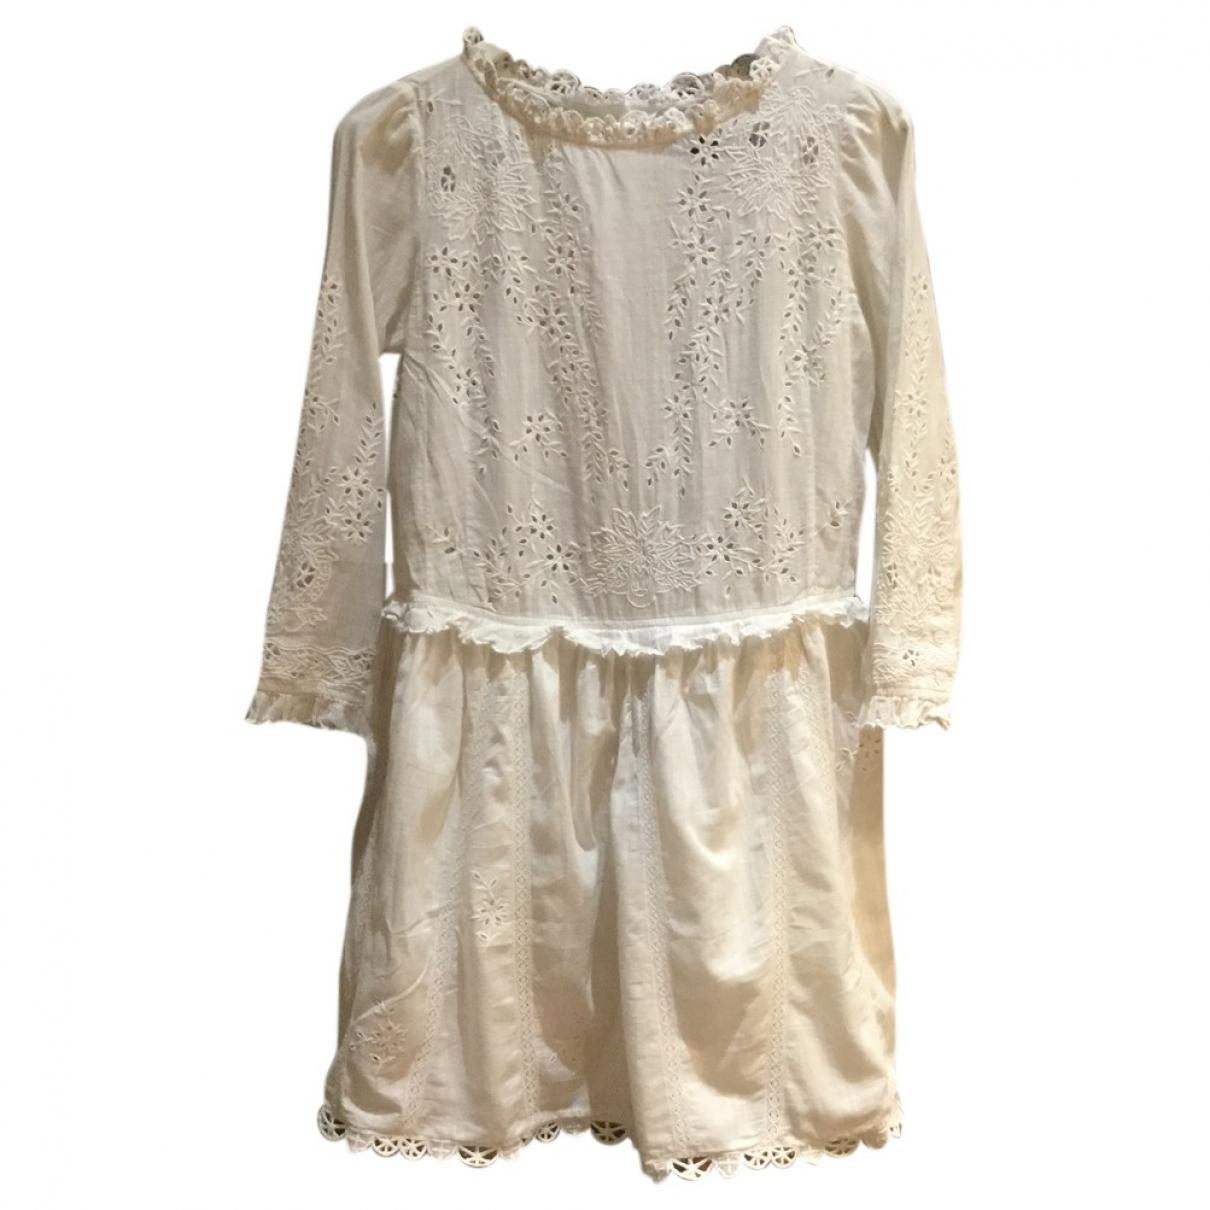 Zadig & Voltaire \N White Cotton dress for Women S International